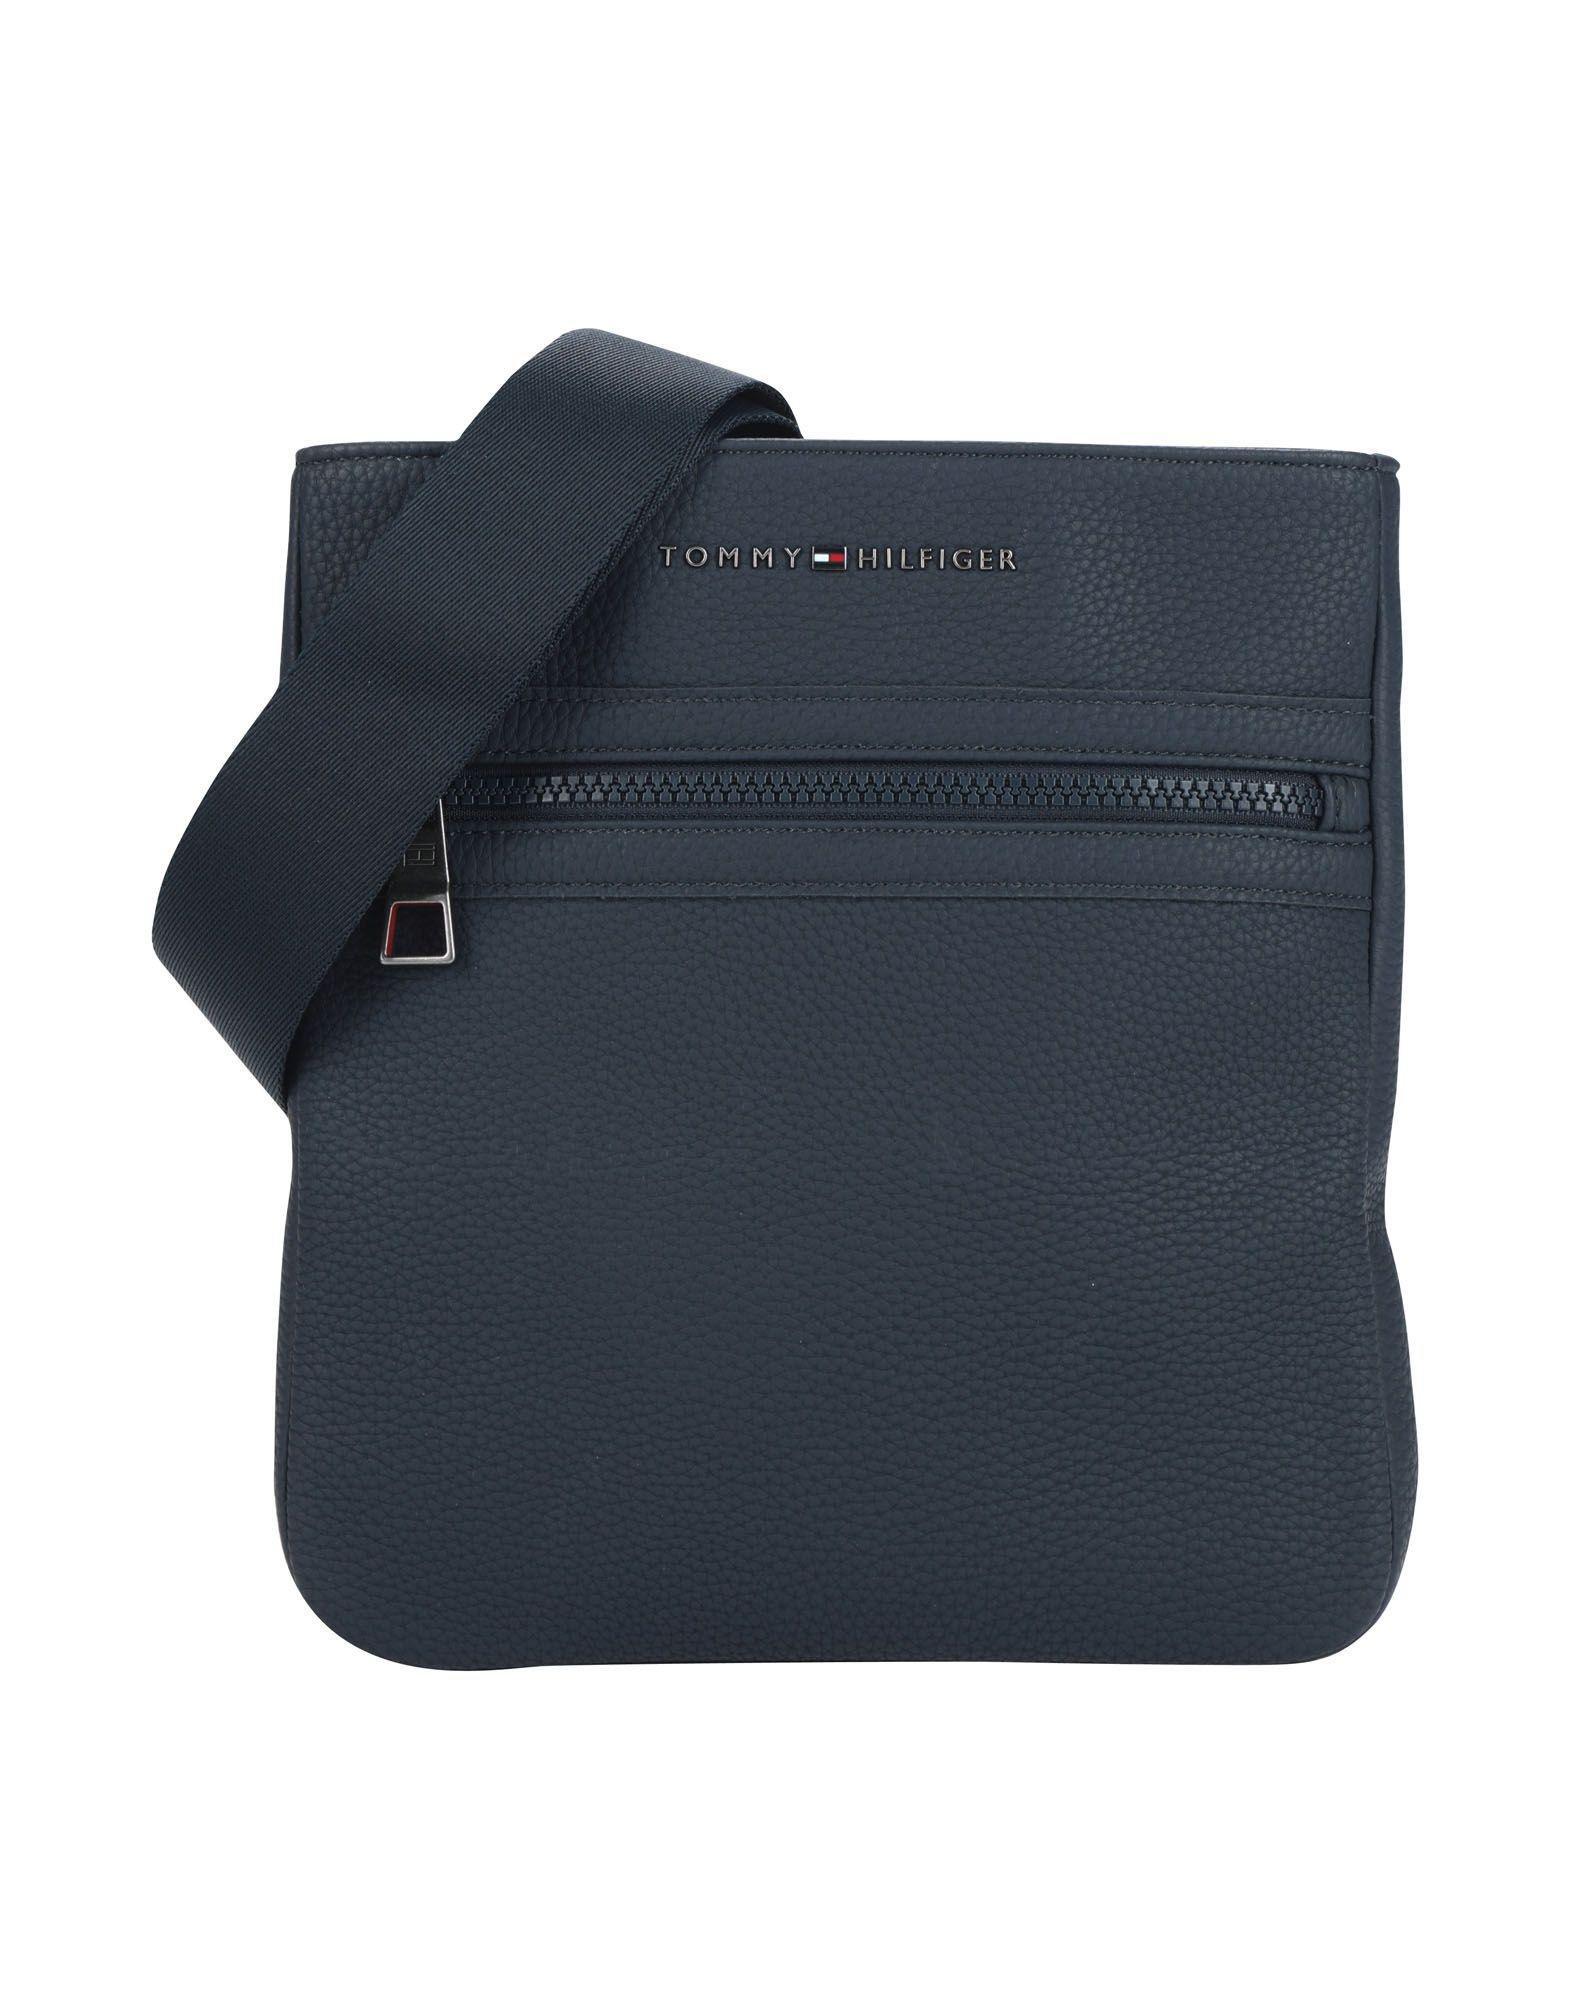 a203bbe7b57 Tommy Hilfiger - Blue Cross-body Bag for Men - Lyst. View fullscreen